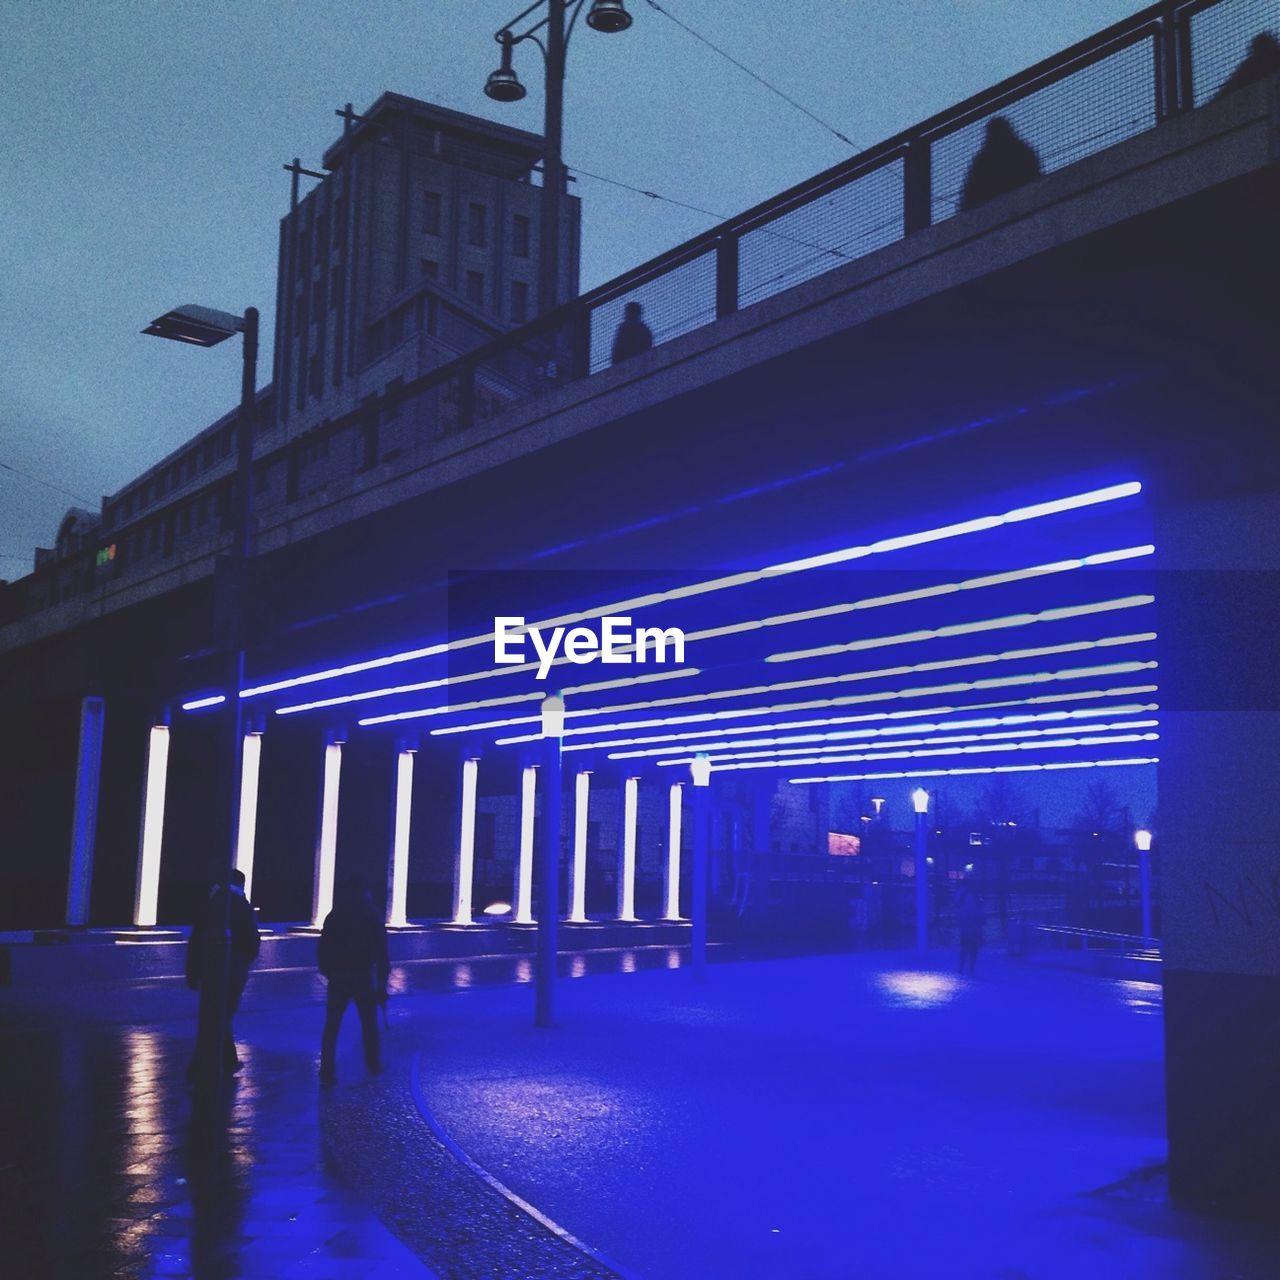 Illuminated blue light fixtures below bridge in city